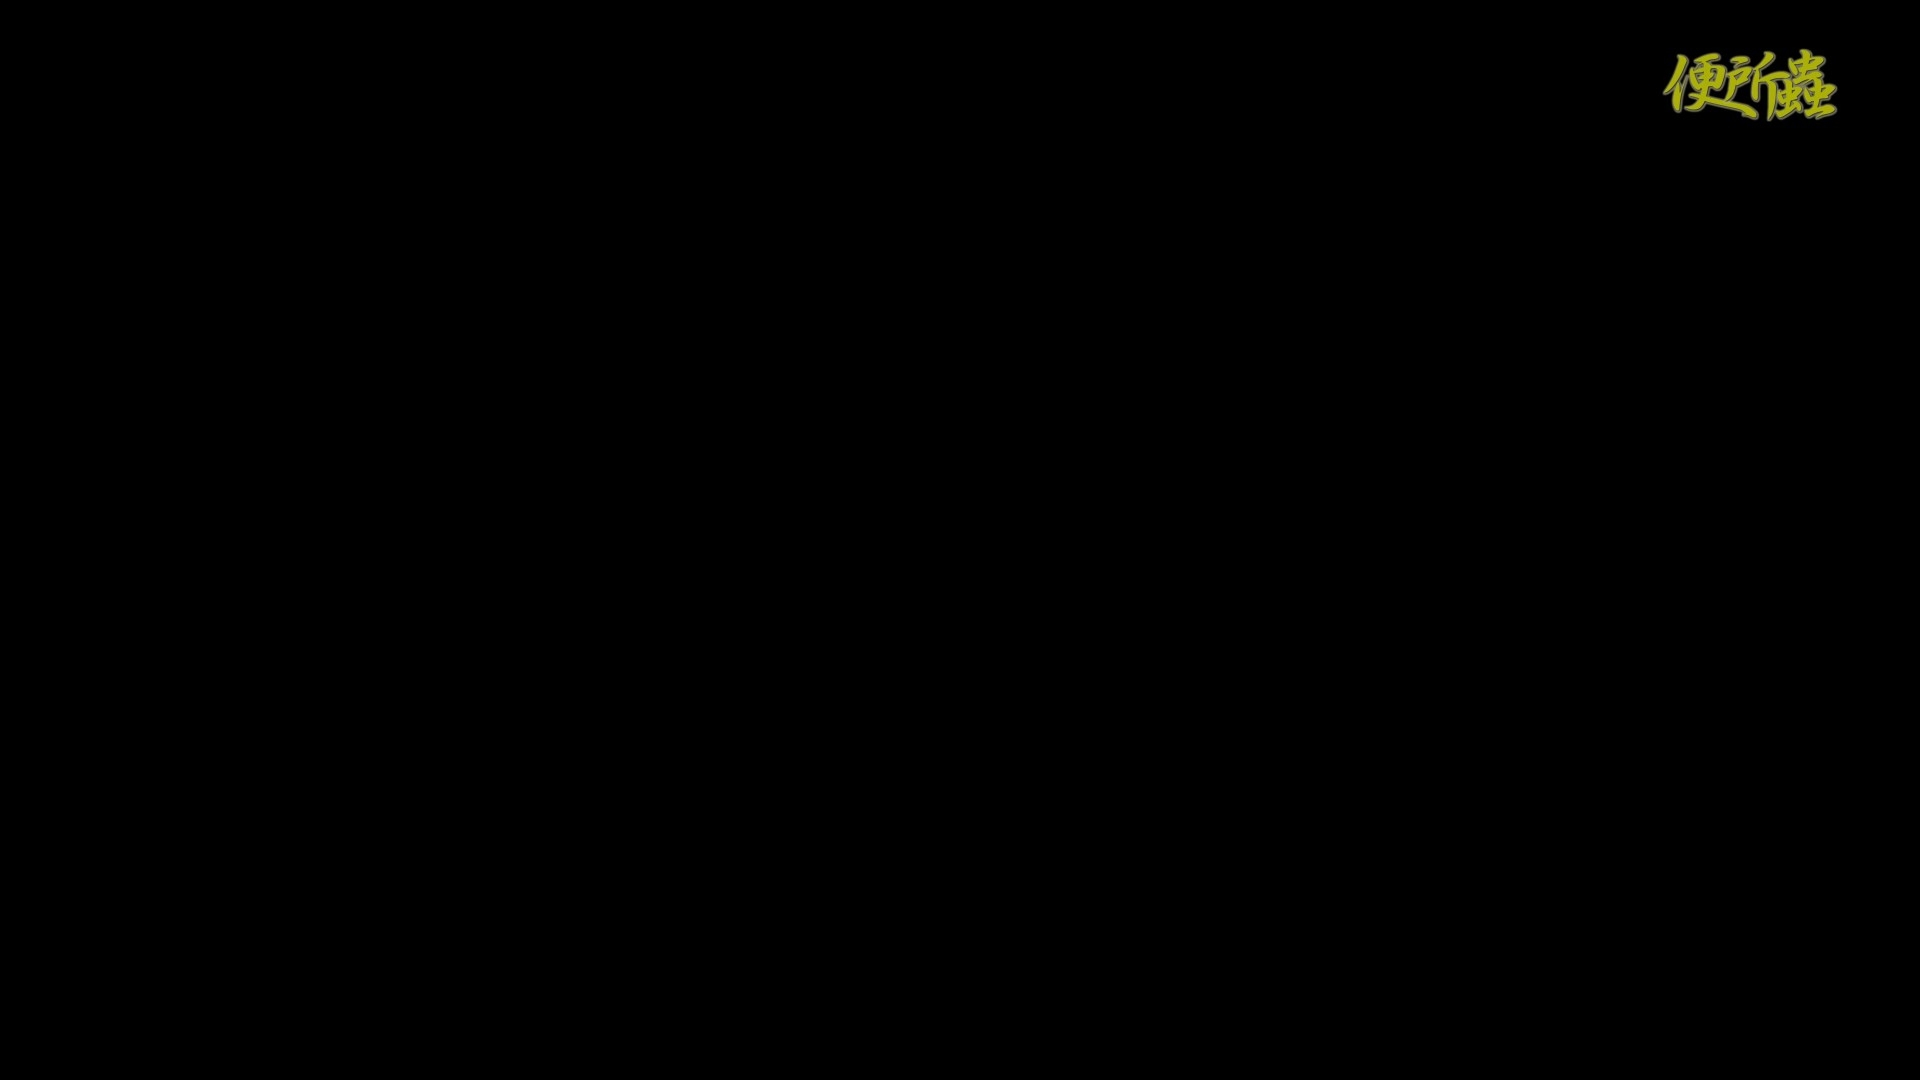 vol.04 便所蟲さんのリターン~寺子屋洗面所盗撮~ 洗面所 セックス無修正動画無料 83連発 58